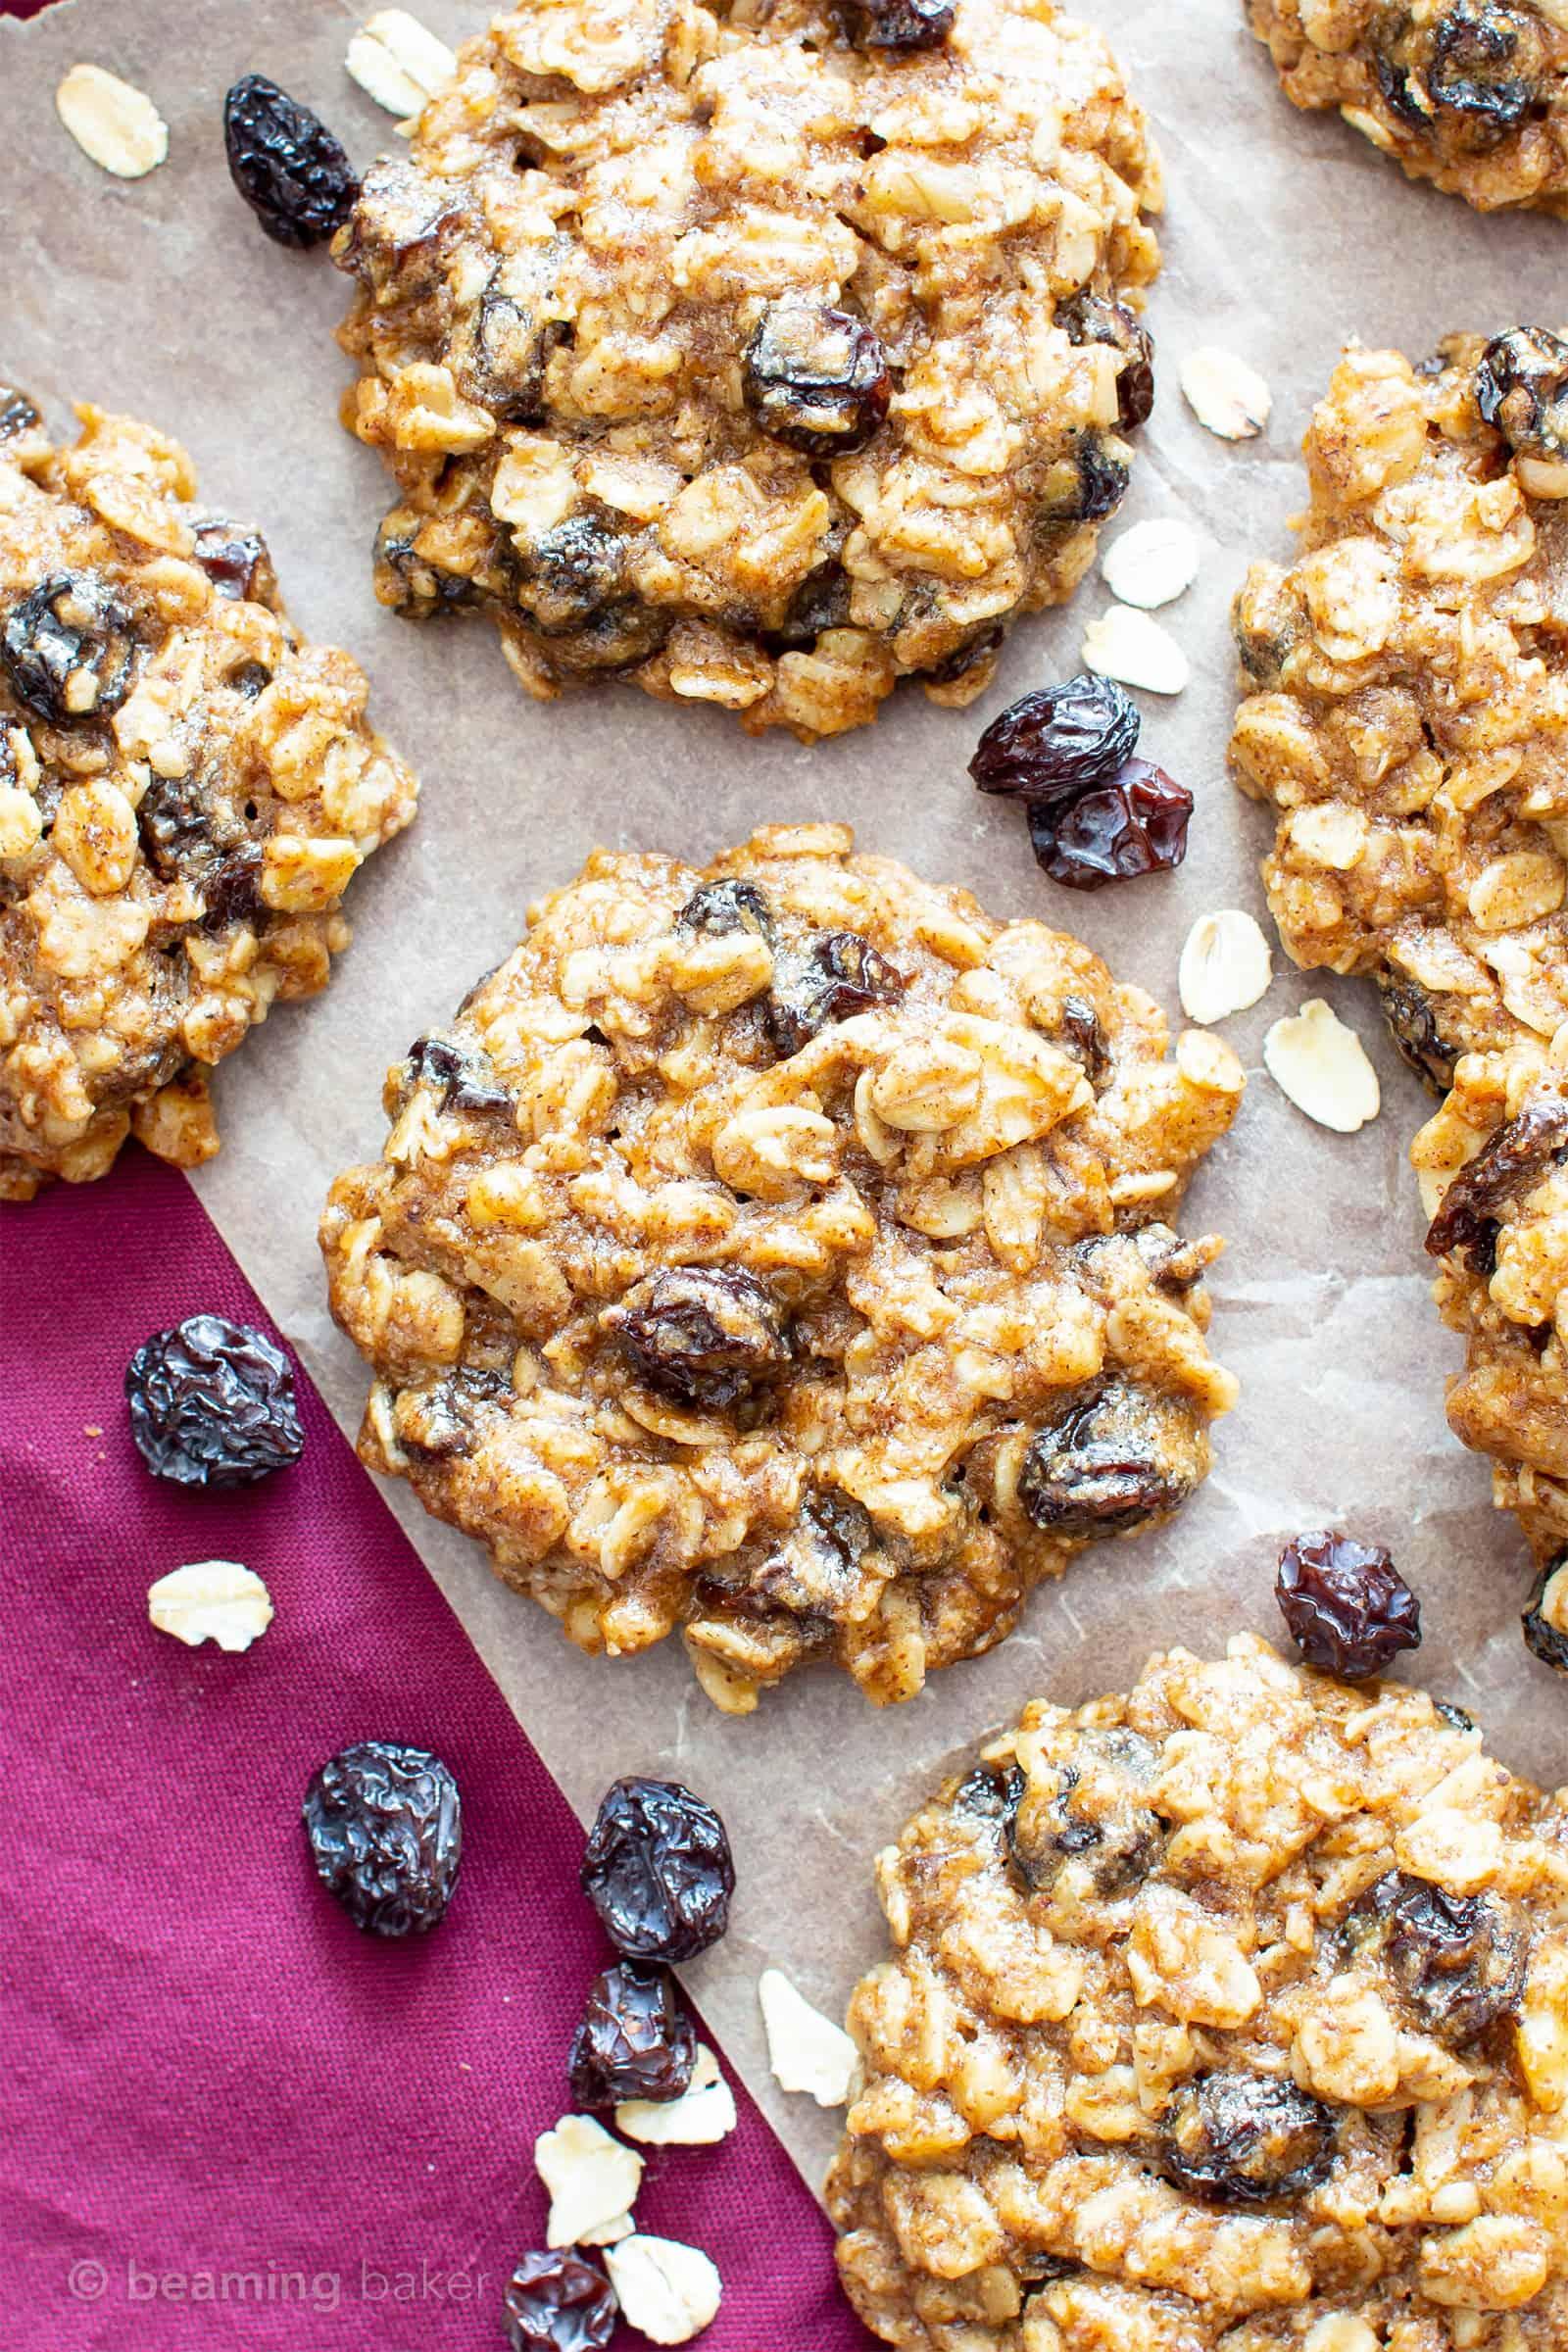 Chewy Oatmeal Raisin Cookie Recipe (V, GF): my favorite easy recipe for moist and chewy oatmeal cookies bursting with plump raisins and amazing flavor! #Vegan #GlutenFree #OatmealRaisin #Cookies #DairyFree #Healthy #HealthyCookies | Recipe at BeamingBaker.com